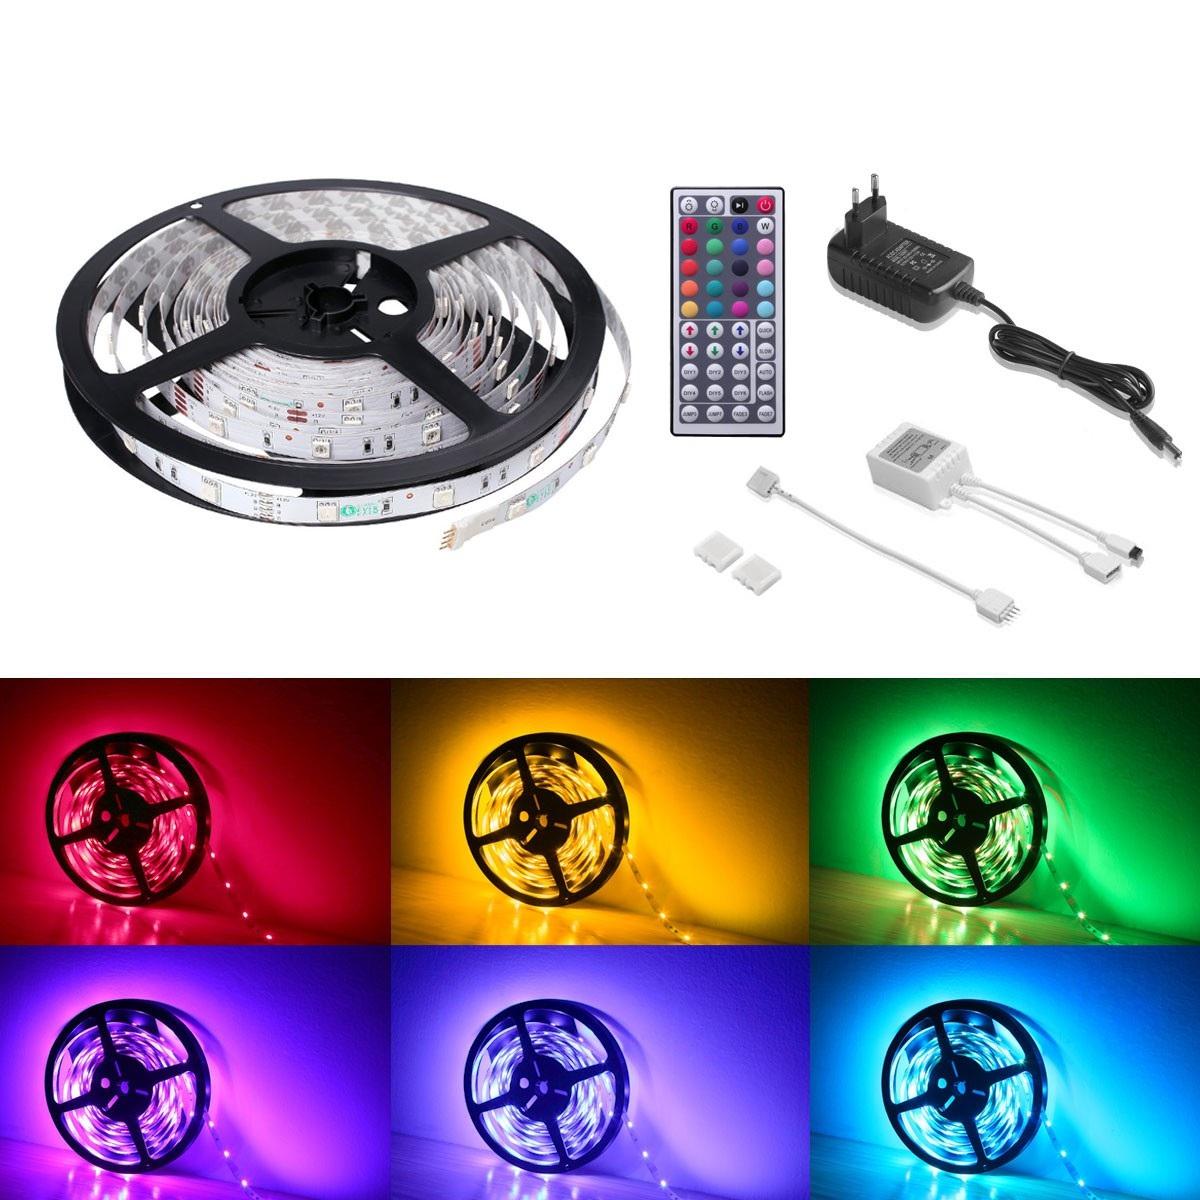 12V LED Lichtleiste RGB Set, Dimmbar, Wasserdicht, 5050 SMD, 5M Indirekte Beleuchtung